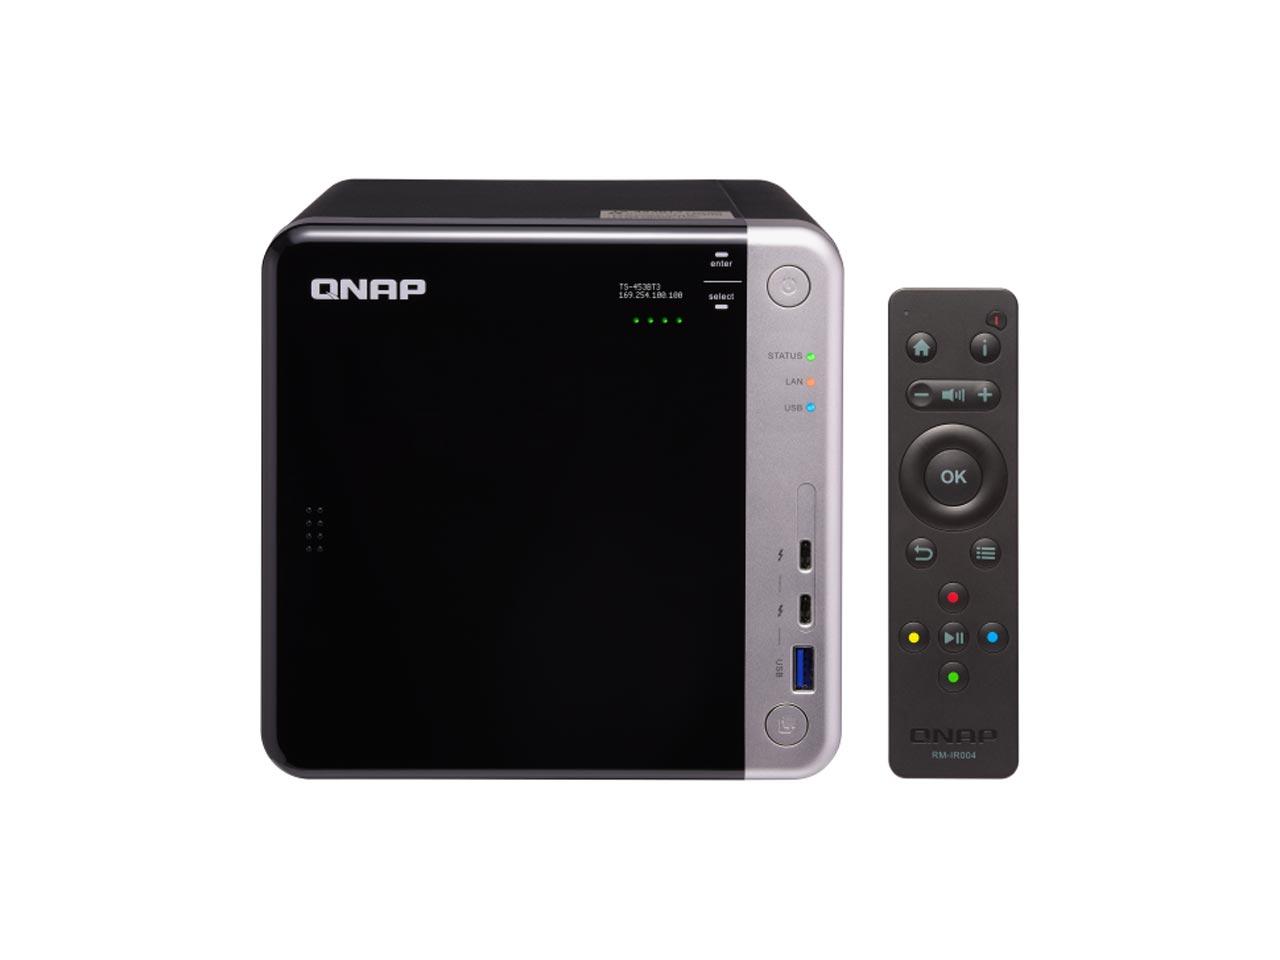 ذخیره ساز تحت شبکه کیونپ TS-453BT3-EU – 8GB |